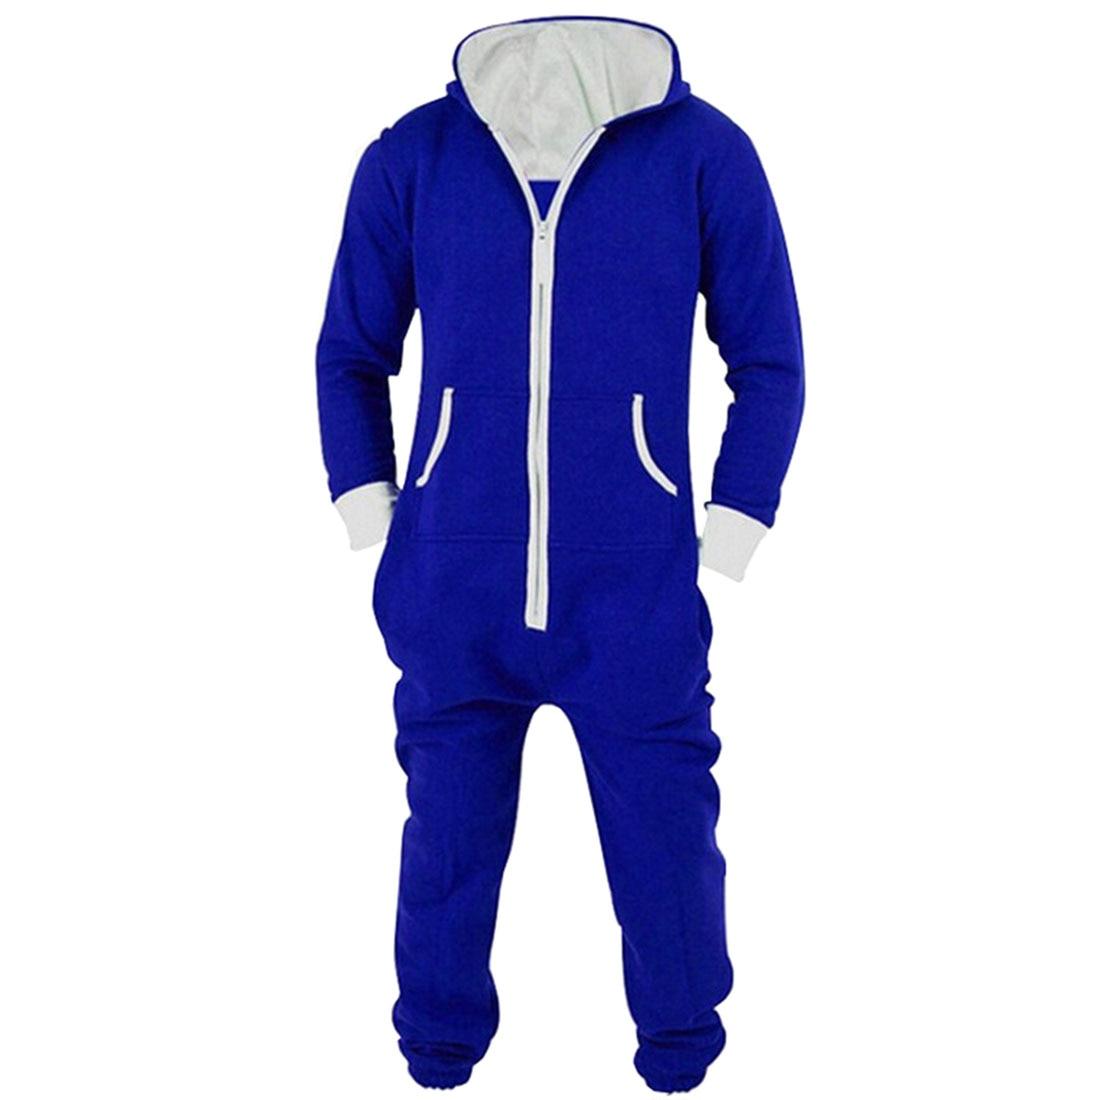 Men/women Jumpsuit Cartoon Sleepwear Cosplay Siamese Pajamas Home Service Long-sleeved 100%cotton Onesies